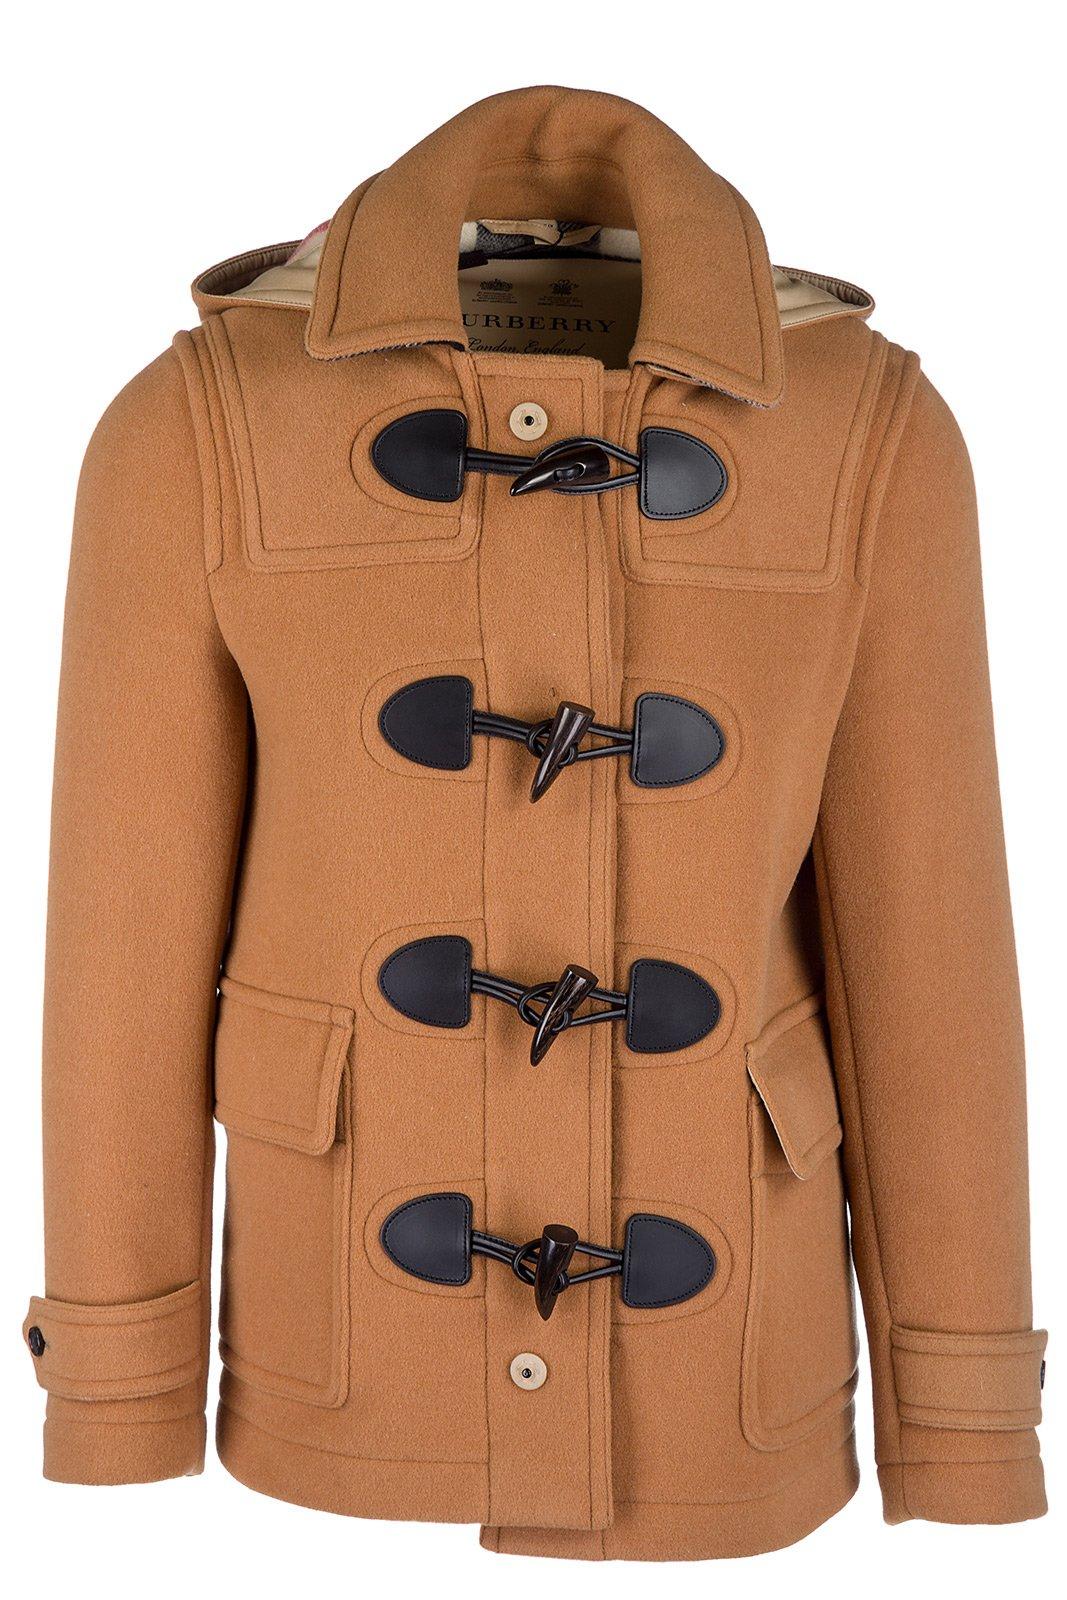 Burberry montgomery duffle coat outwear men original plymouth beige US size 52 (US 42) 4059551